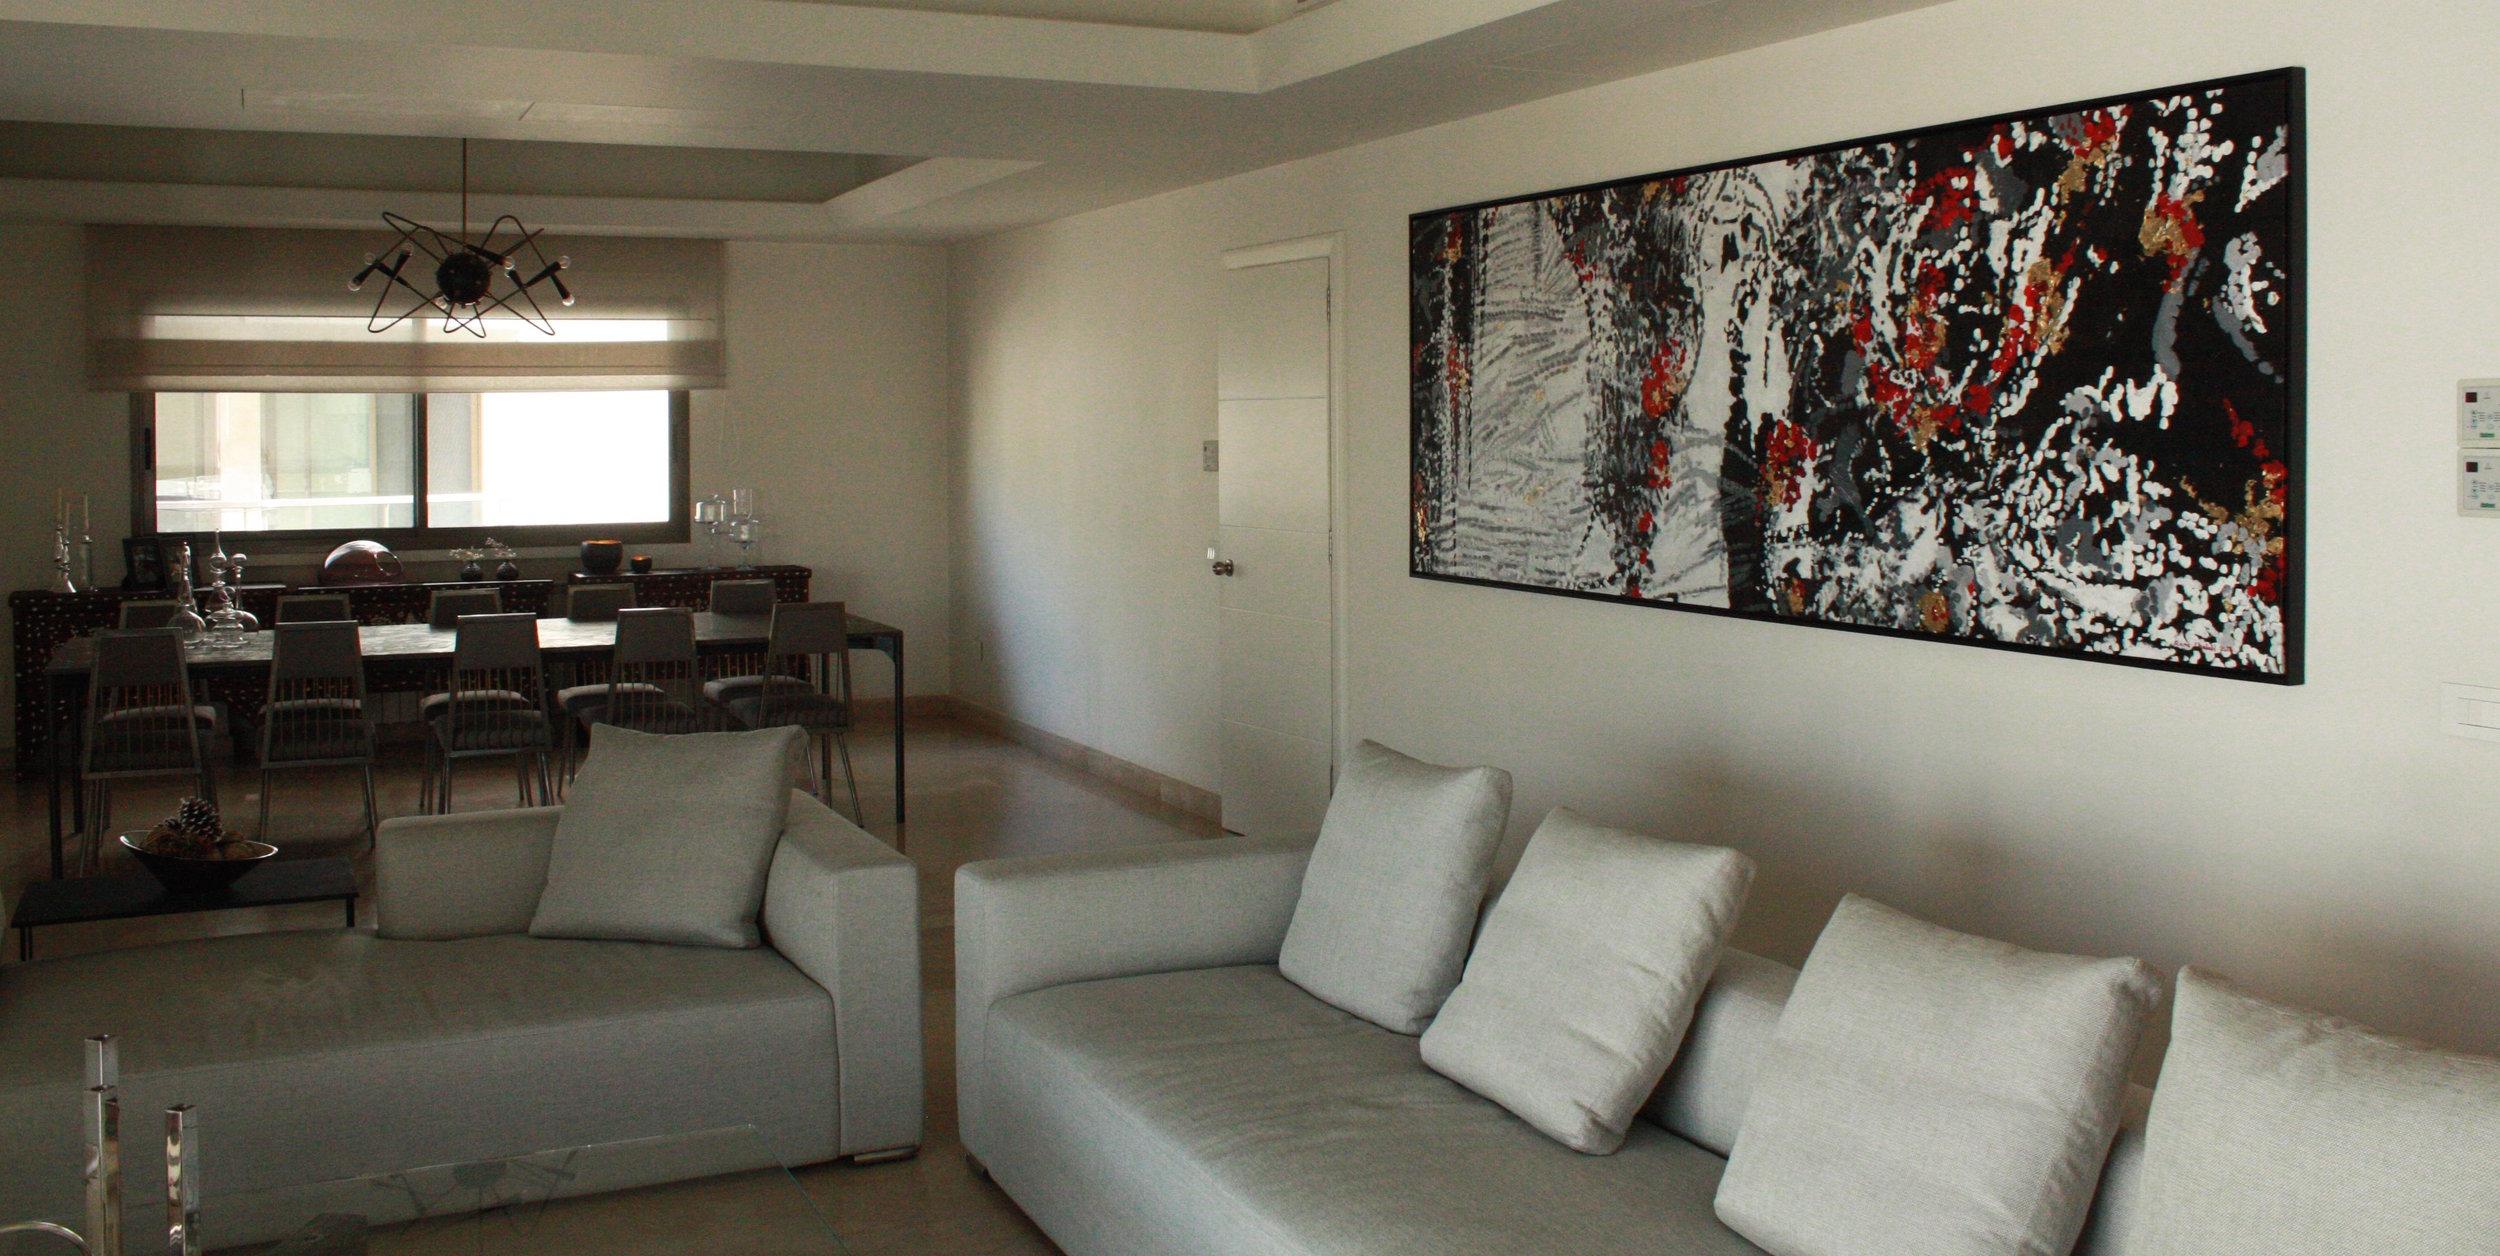 Tawile Residence, Beirut, Lebanon